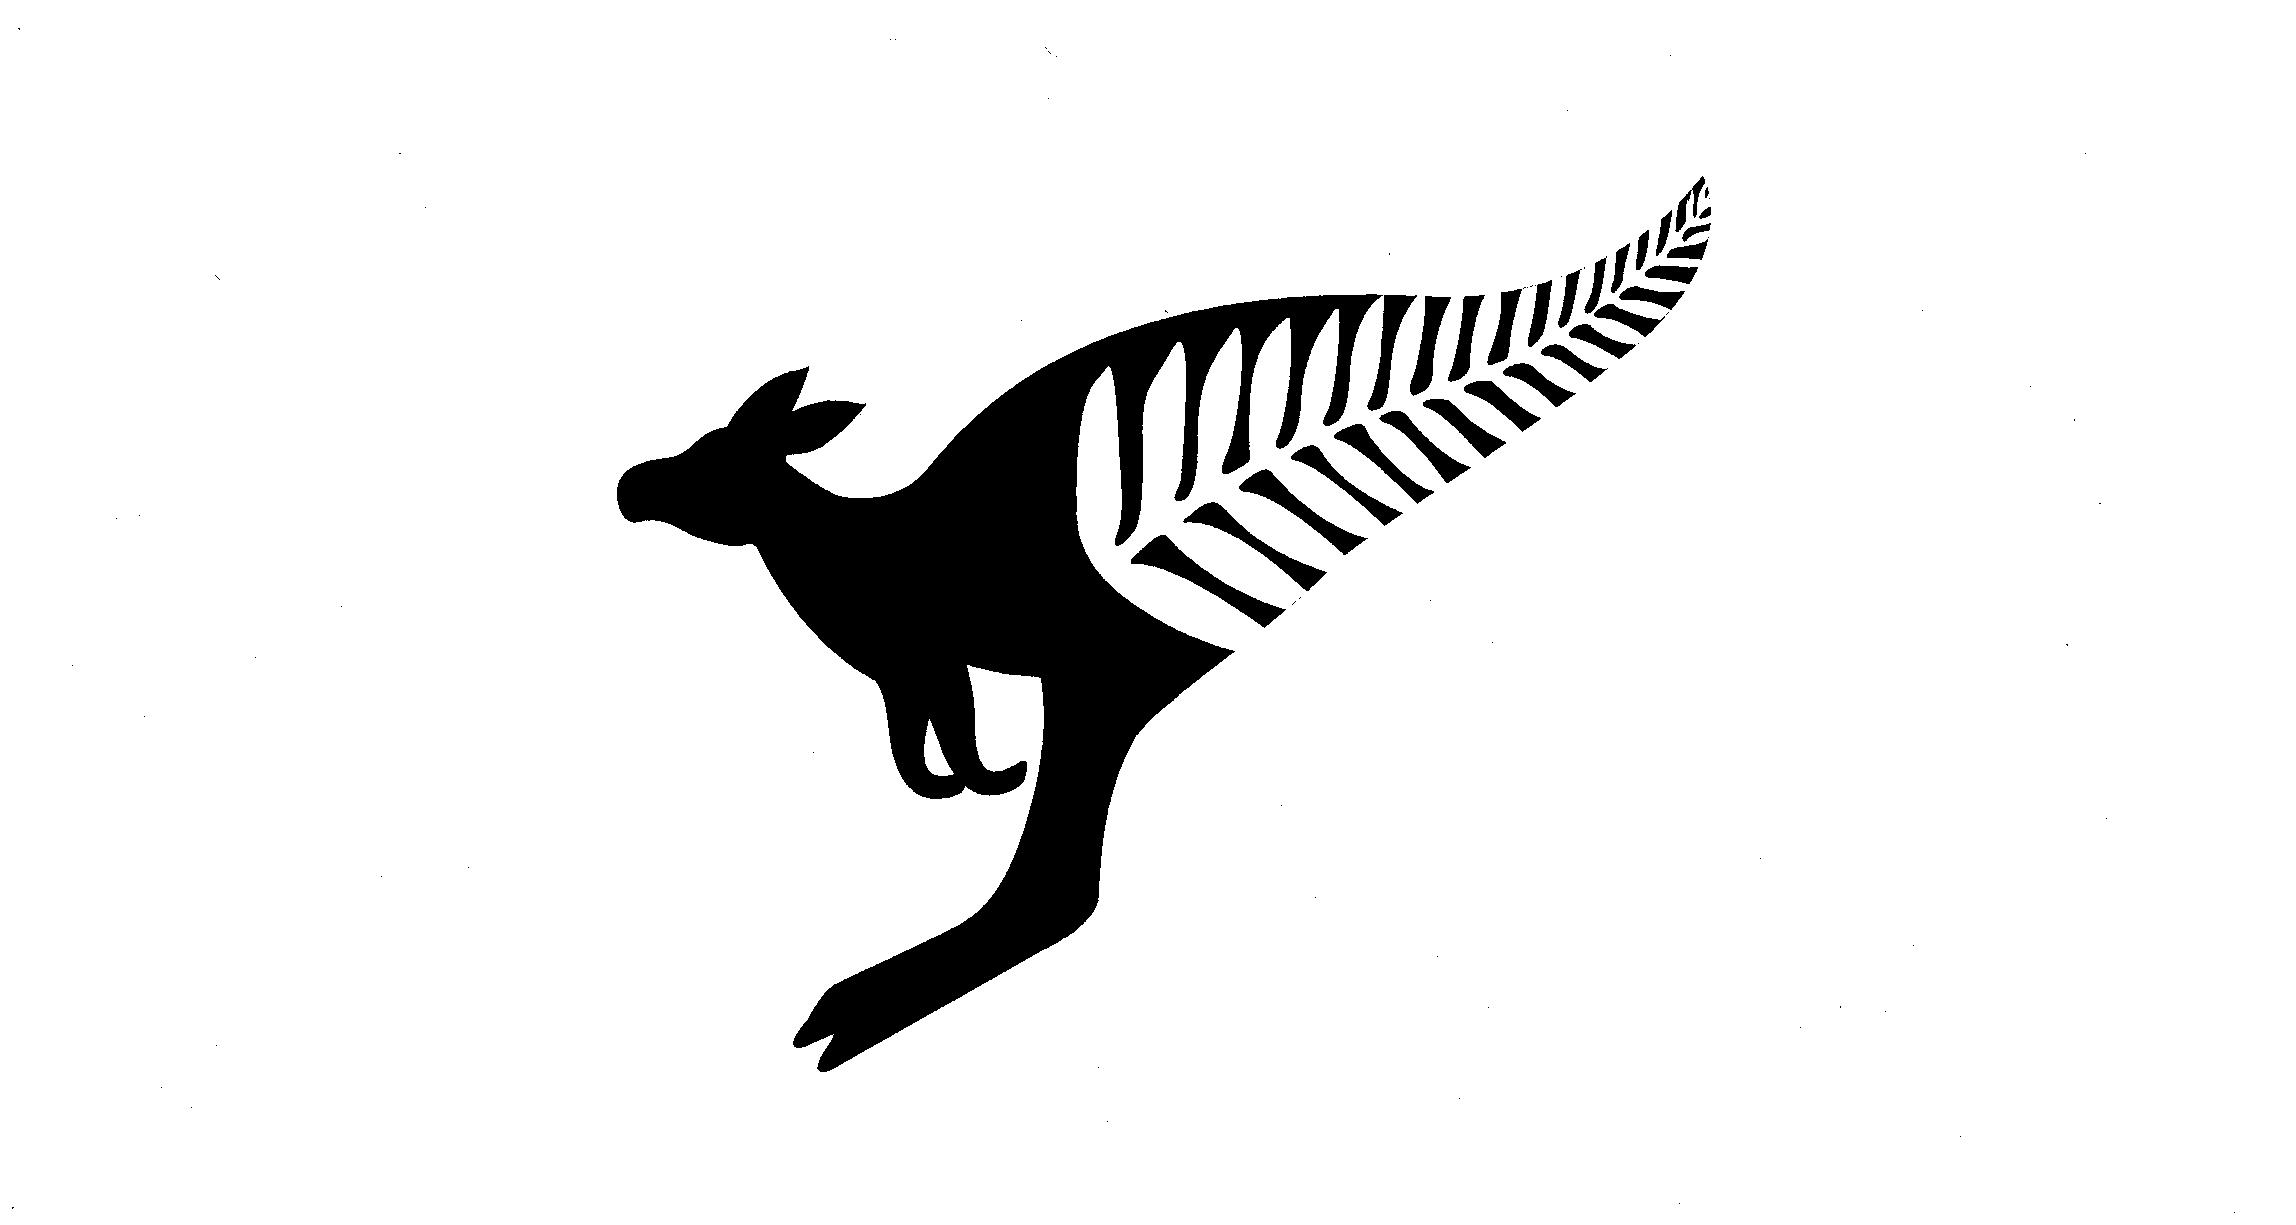 Silhouette Kangaroo - ClipArt Best